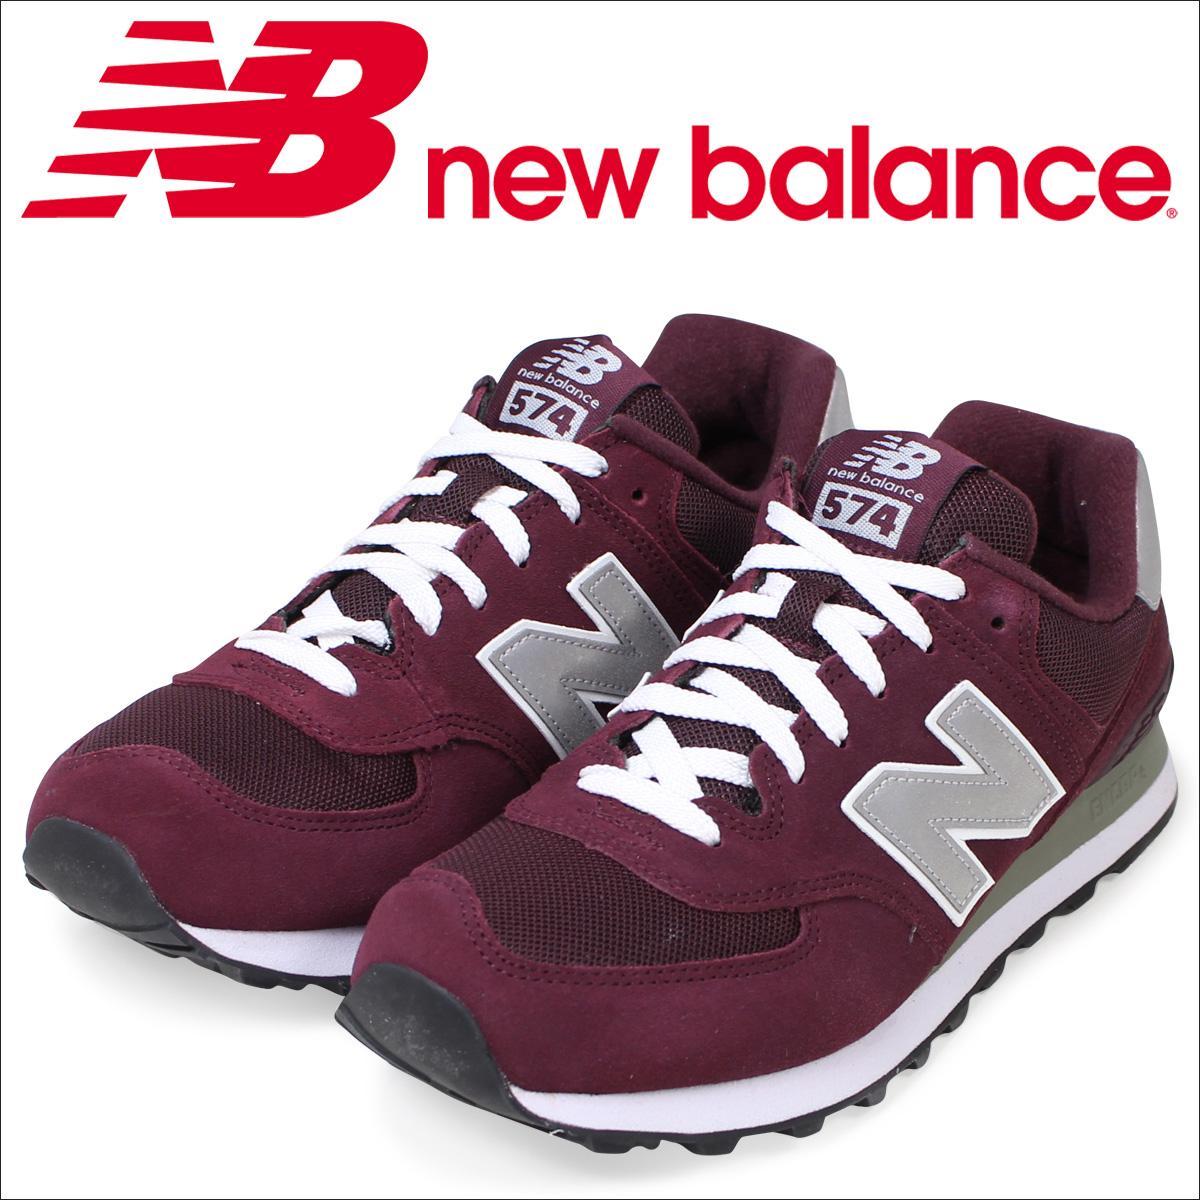 New Balance 1080 maron